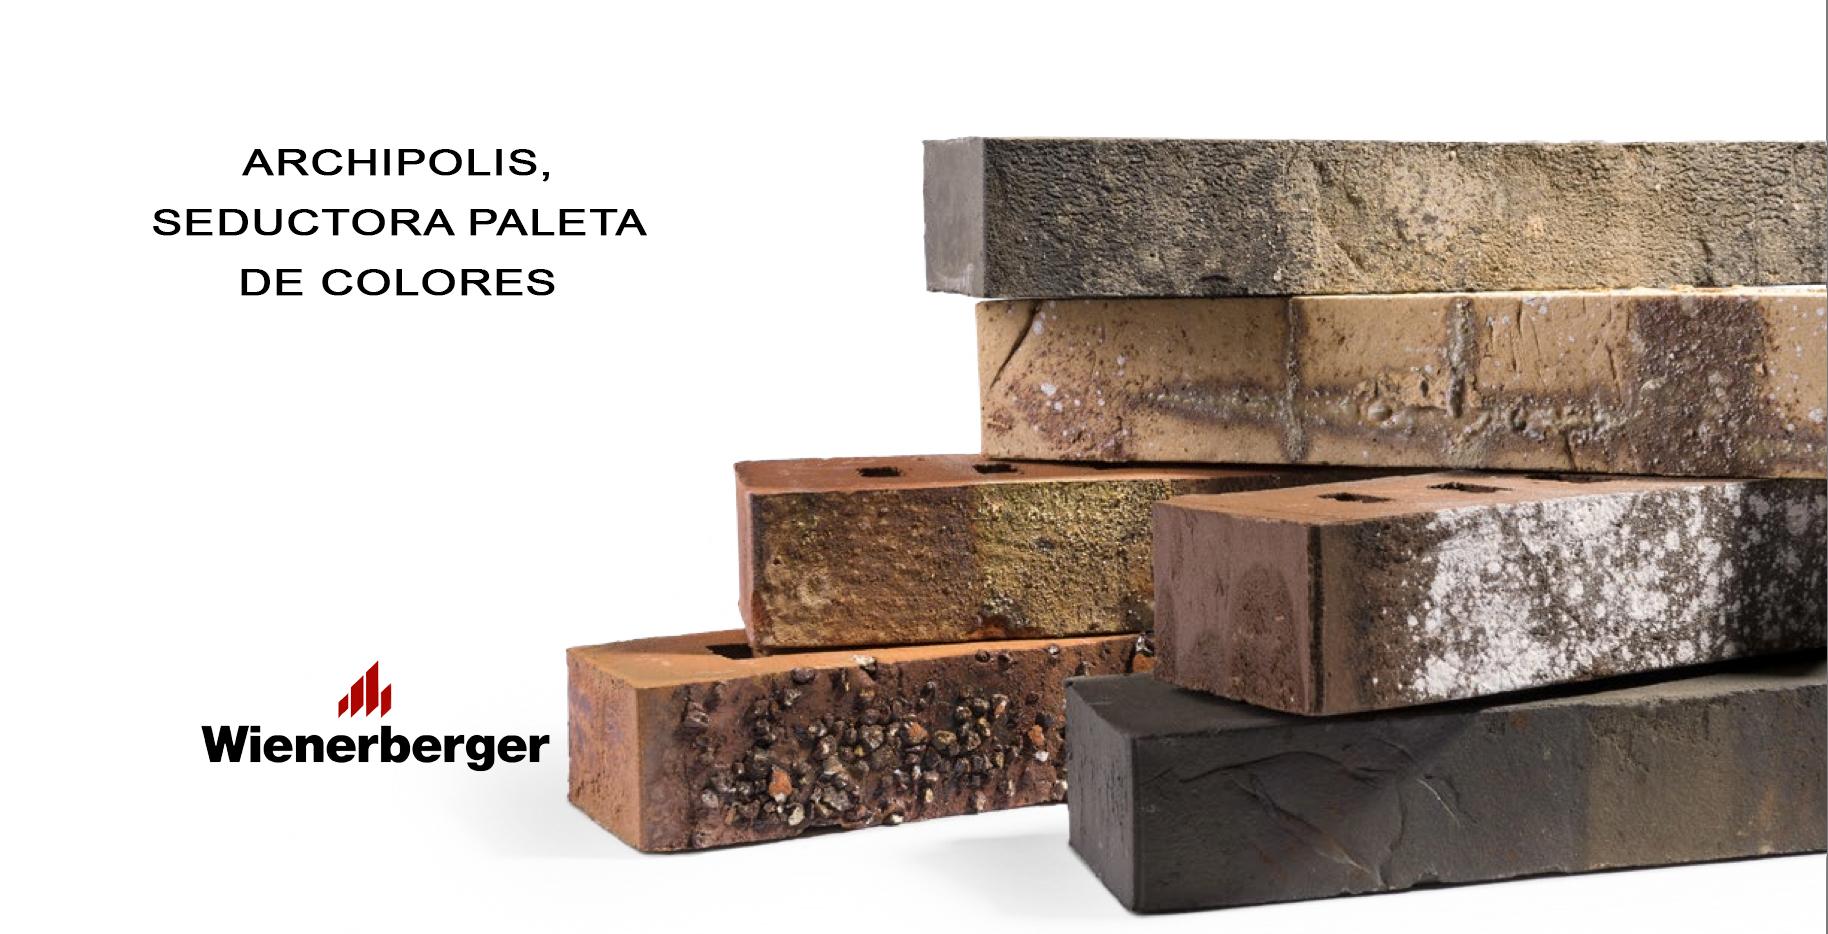 ditail-materiales-construccion-wienerberger-pr_ter_2018_archipolis-